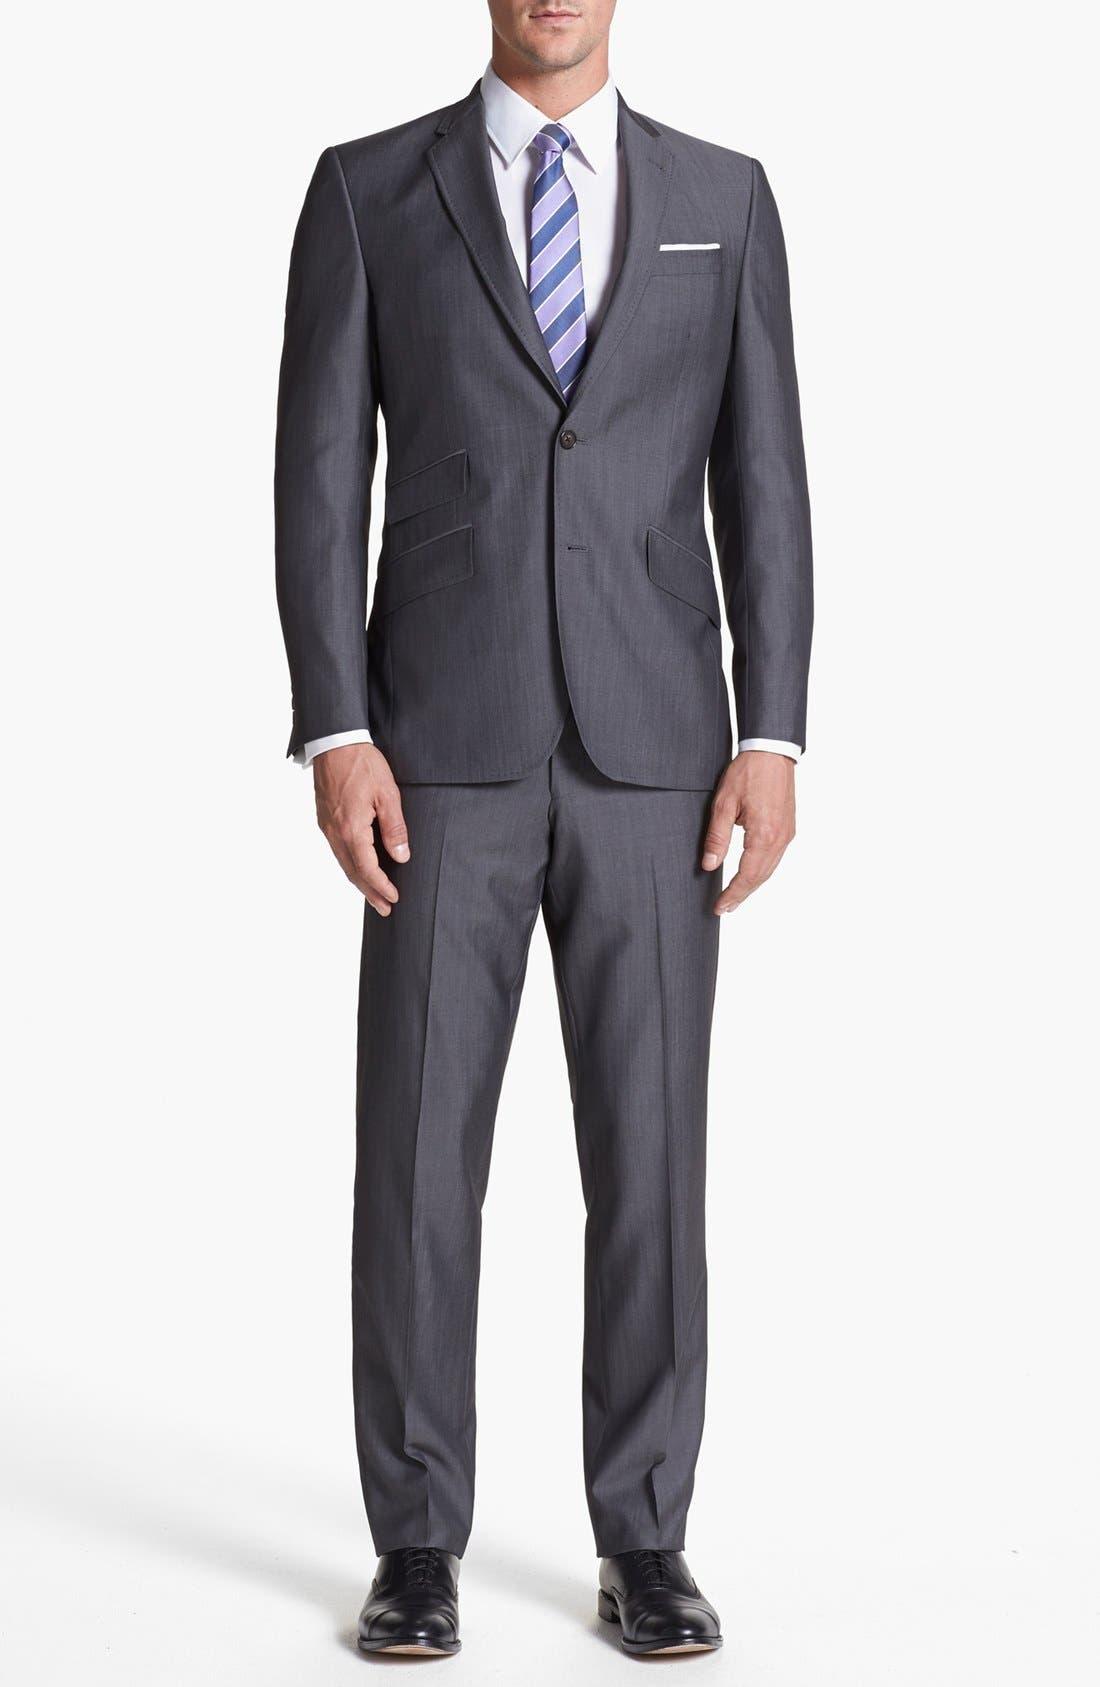 Main Image - Ted Baker London 'Jim' Grey Wool Suit